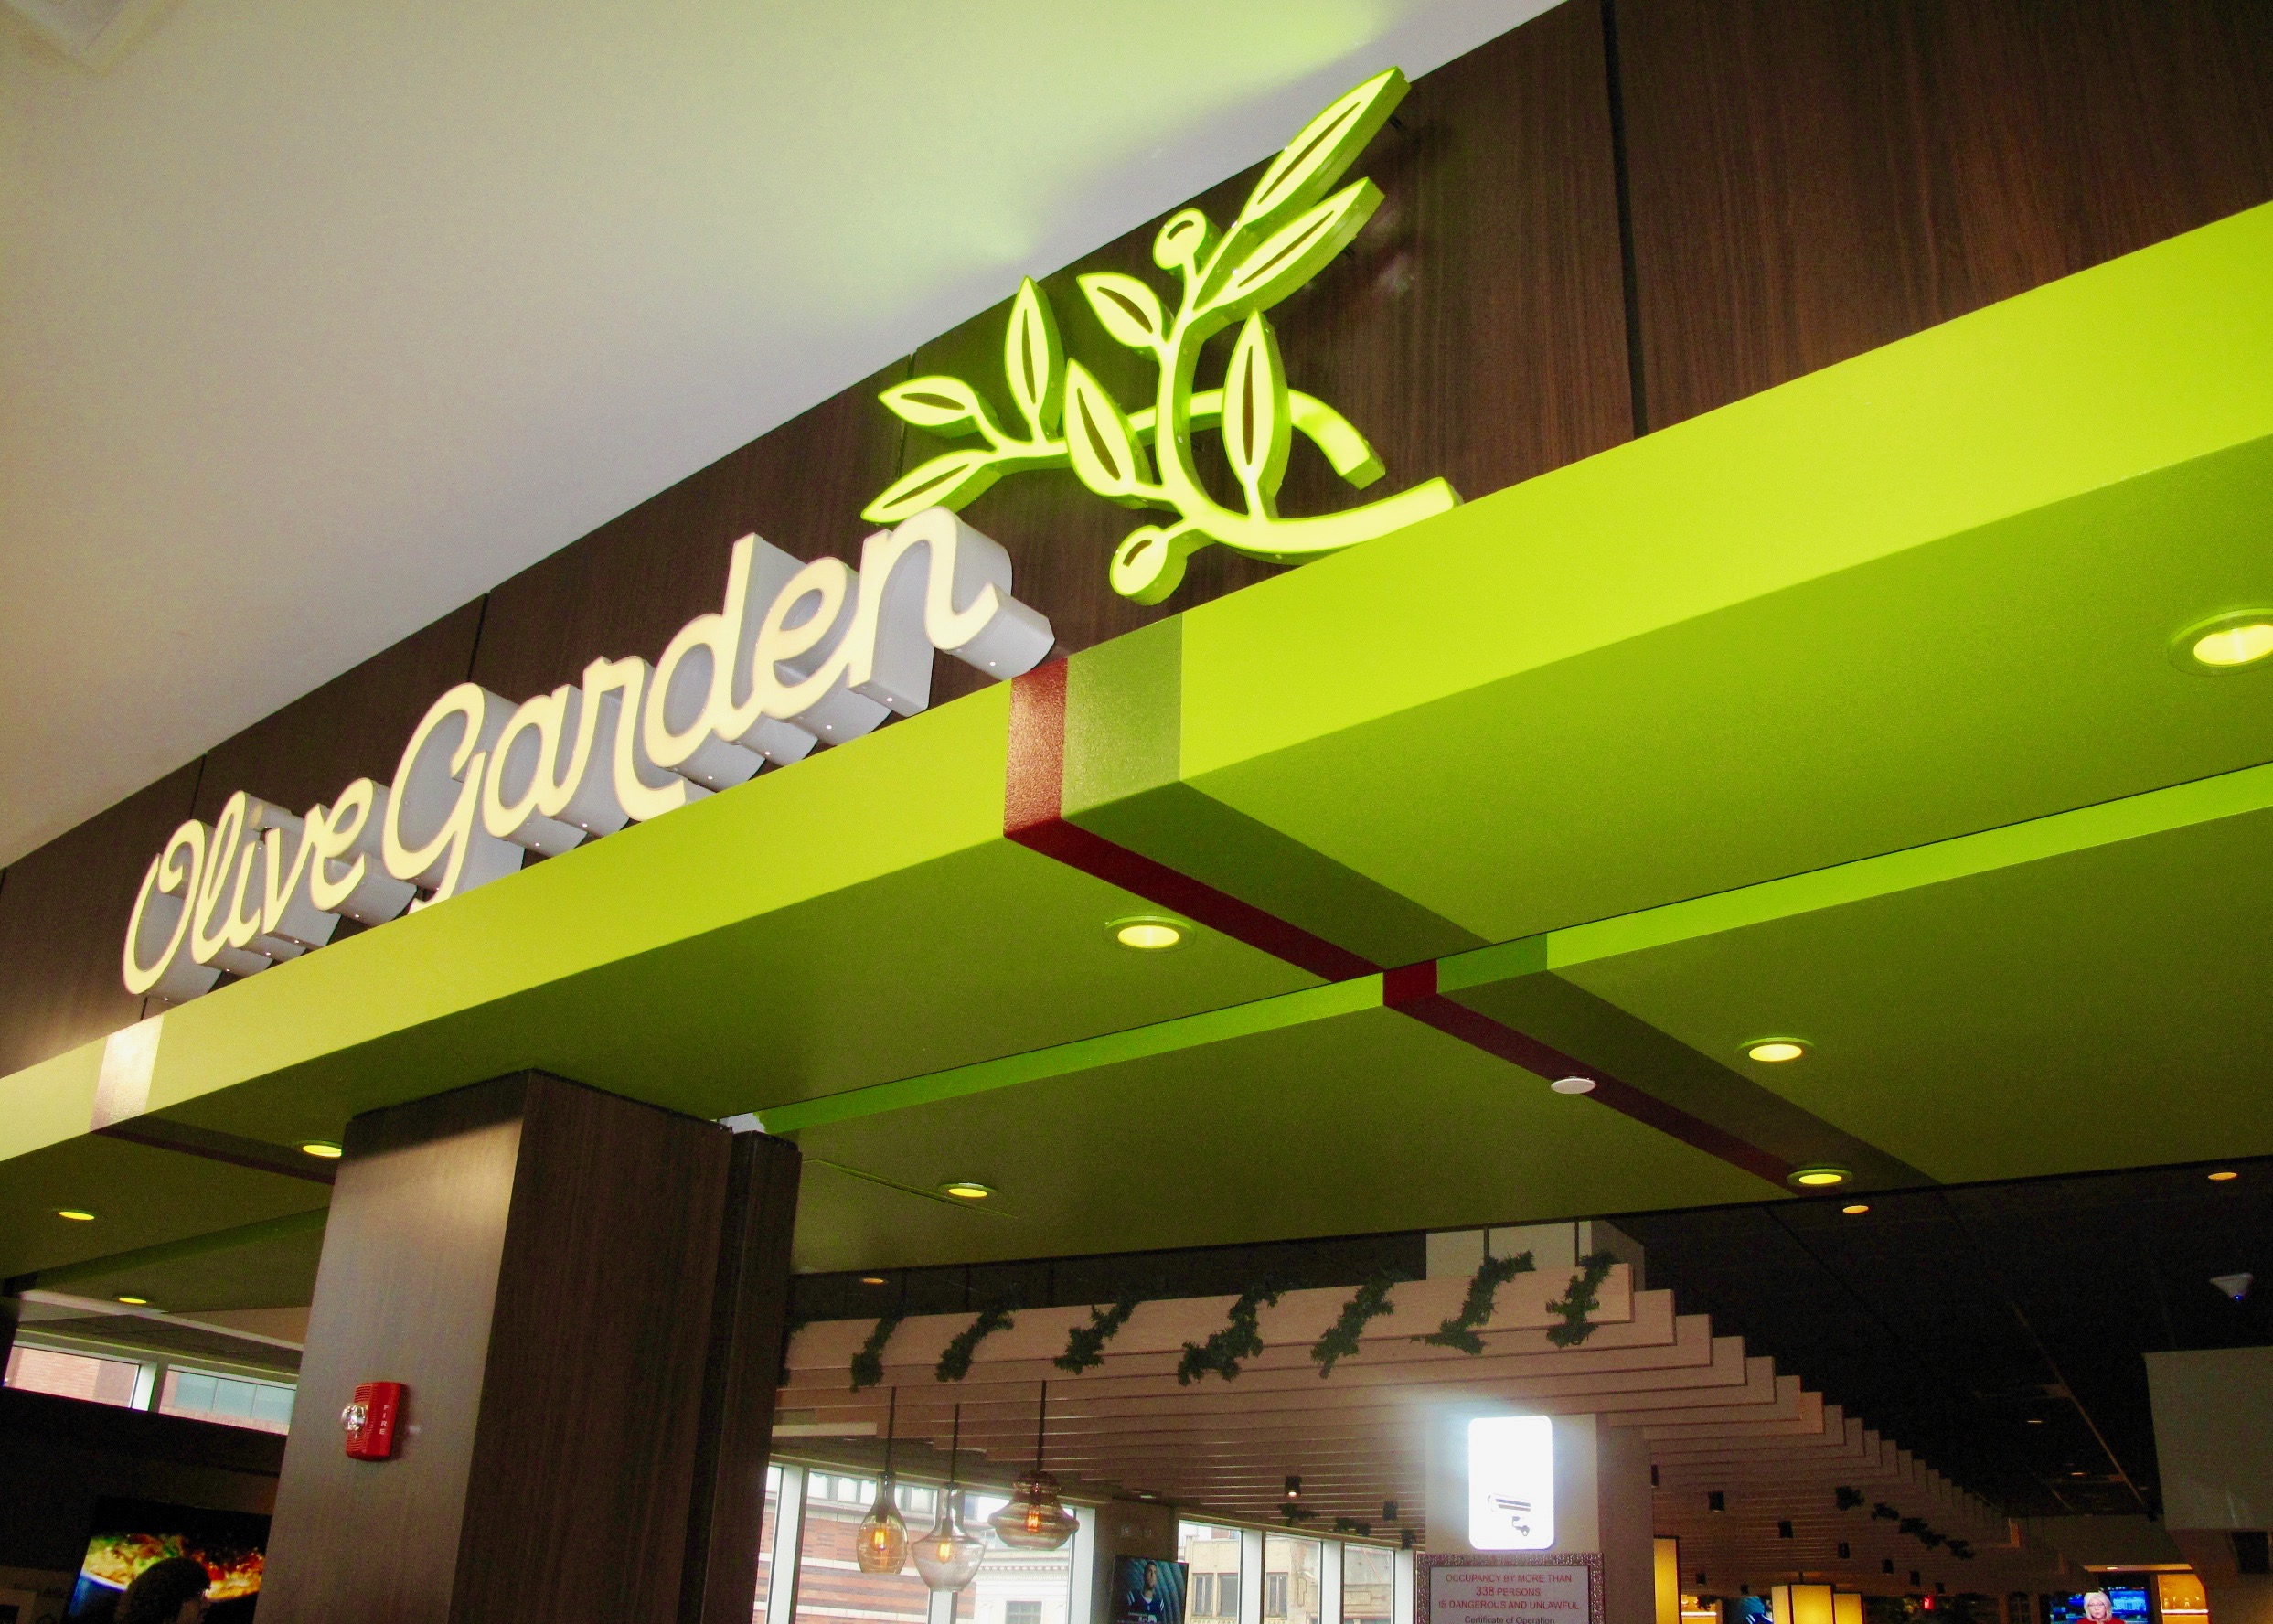 Breadsticks For Everyone Olive Garden Opens In Harlem New York